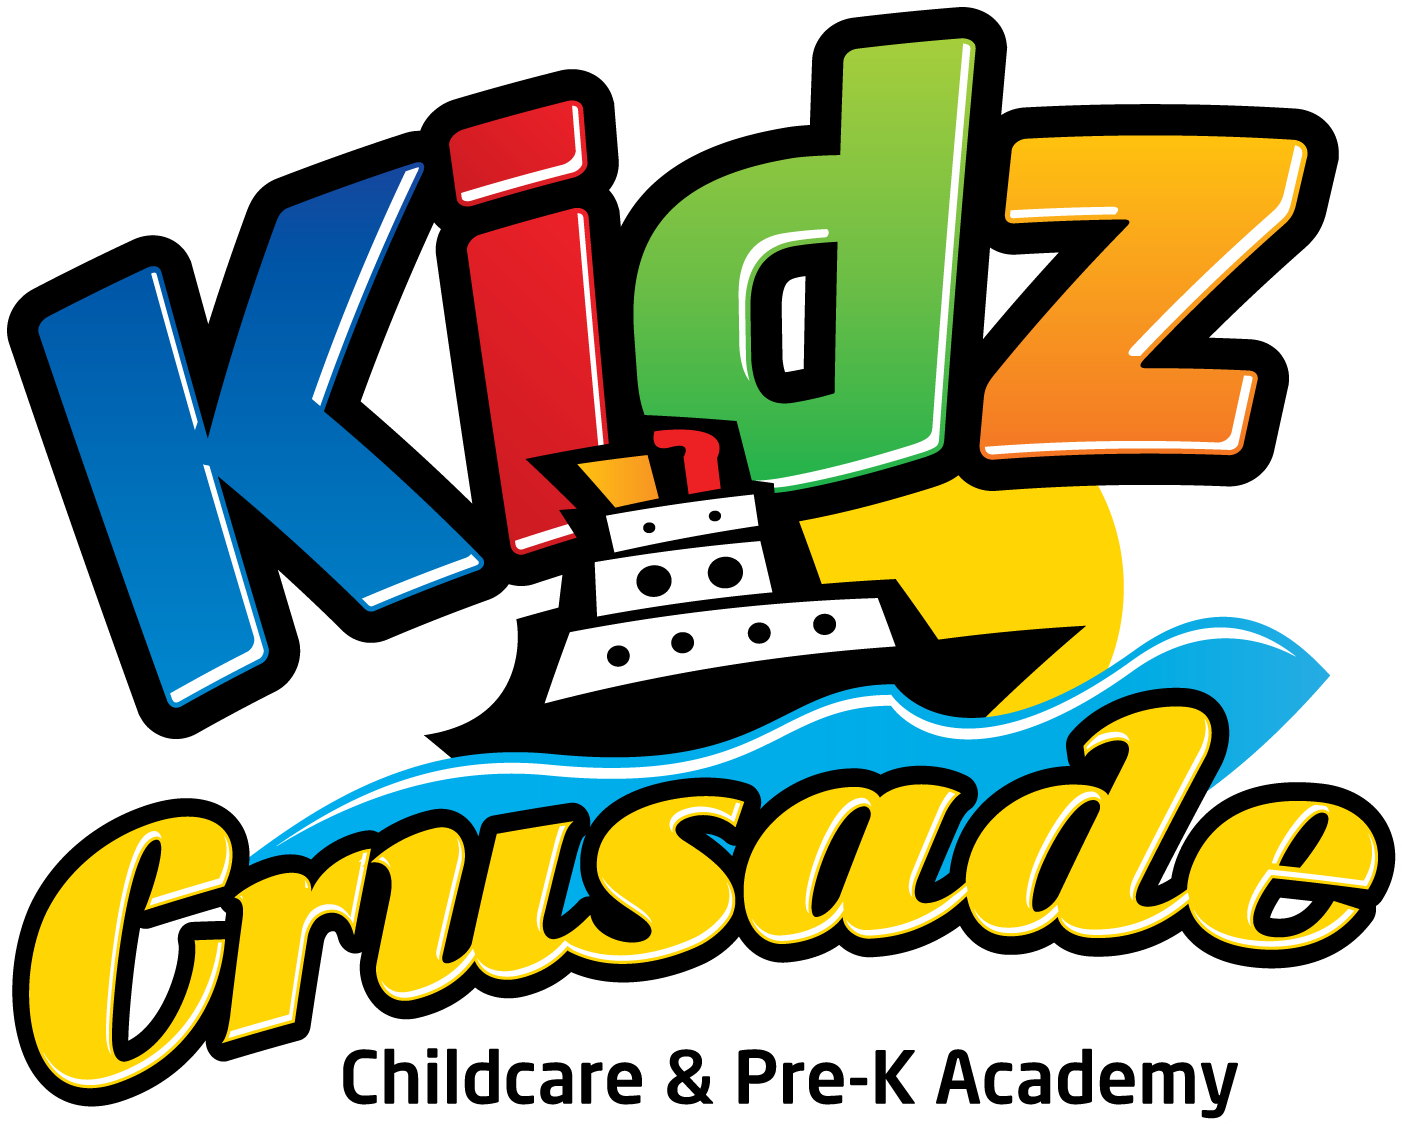 Kidz Crusade